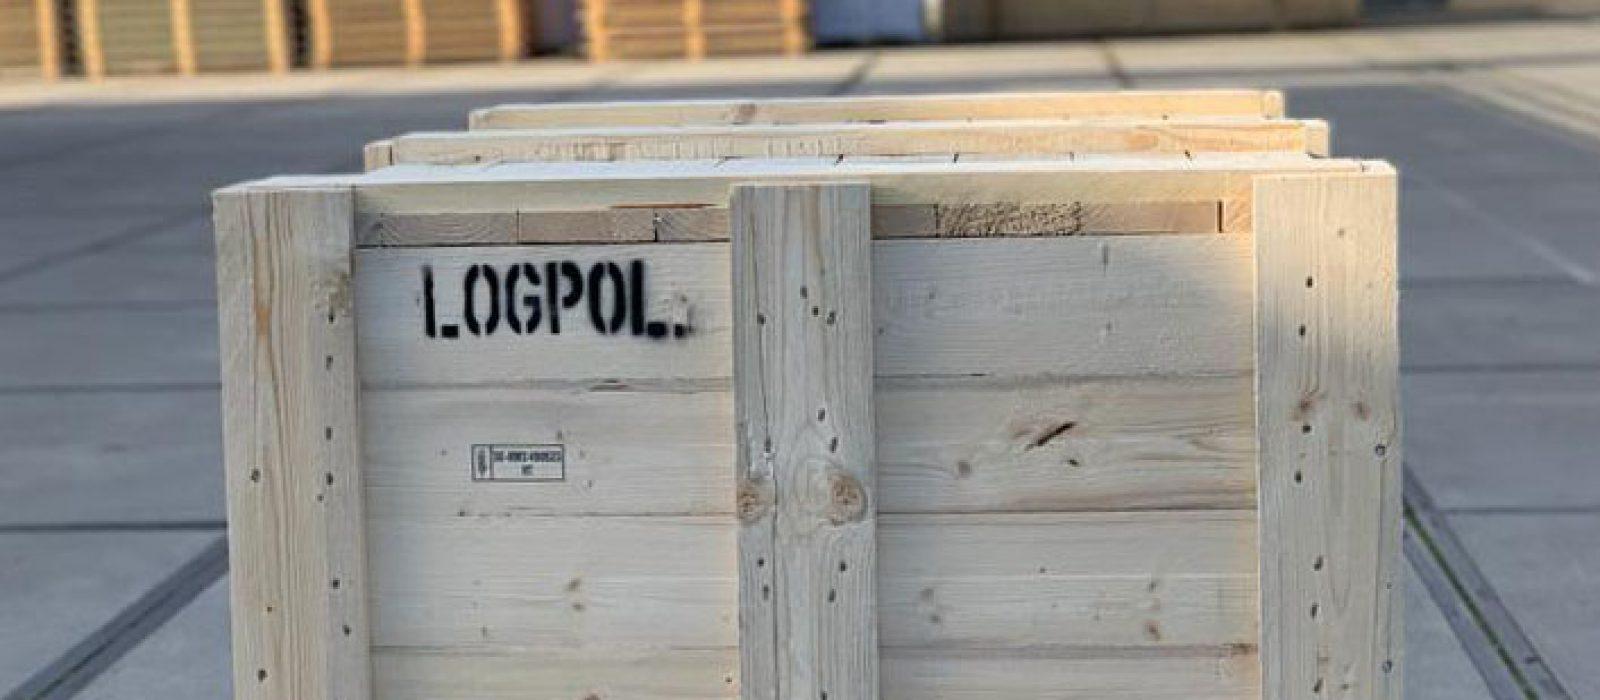 Holzkiste-1200x800x700-NRW-LOGPOL